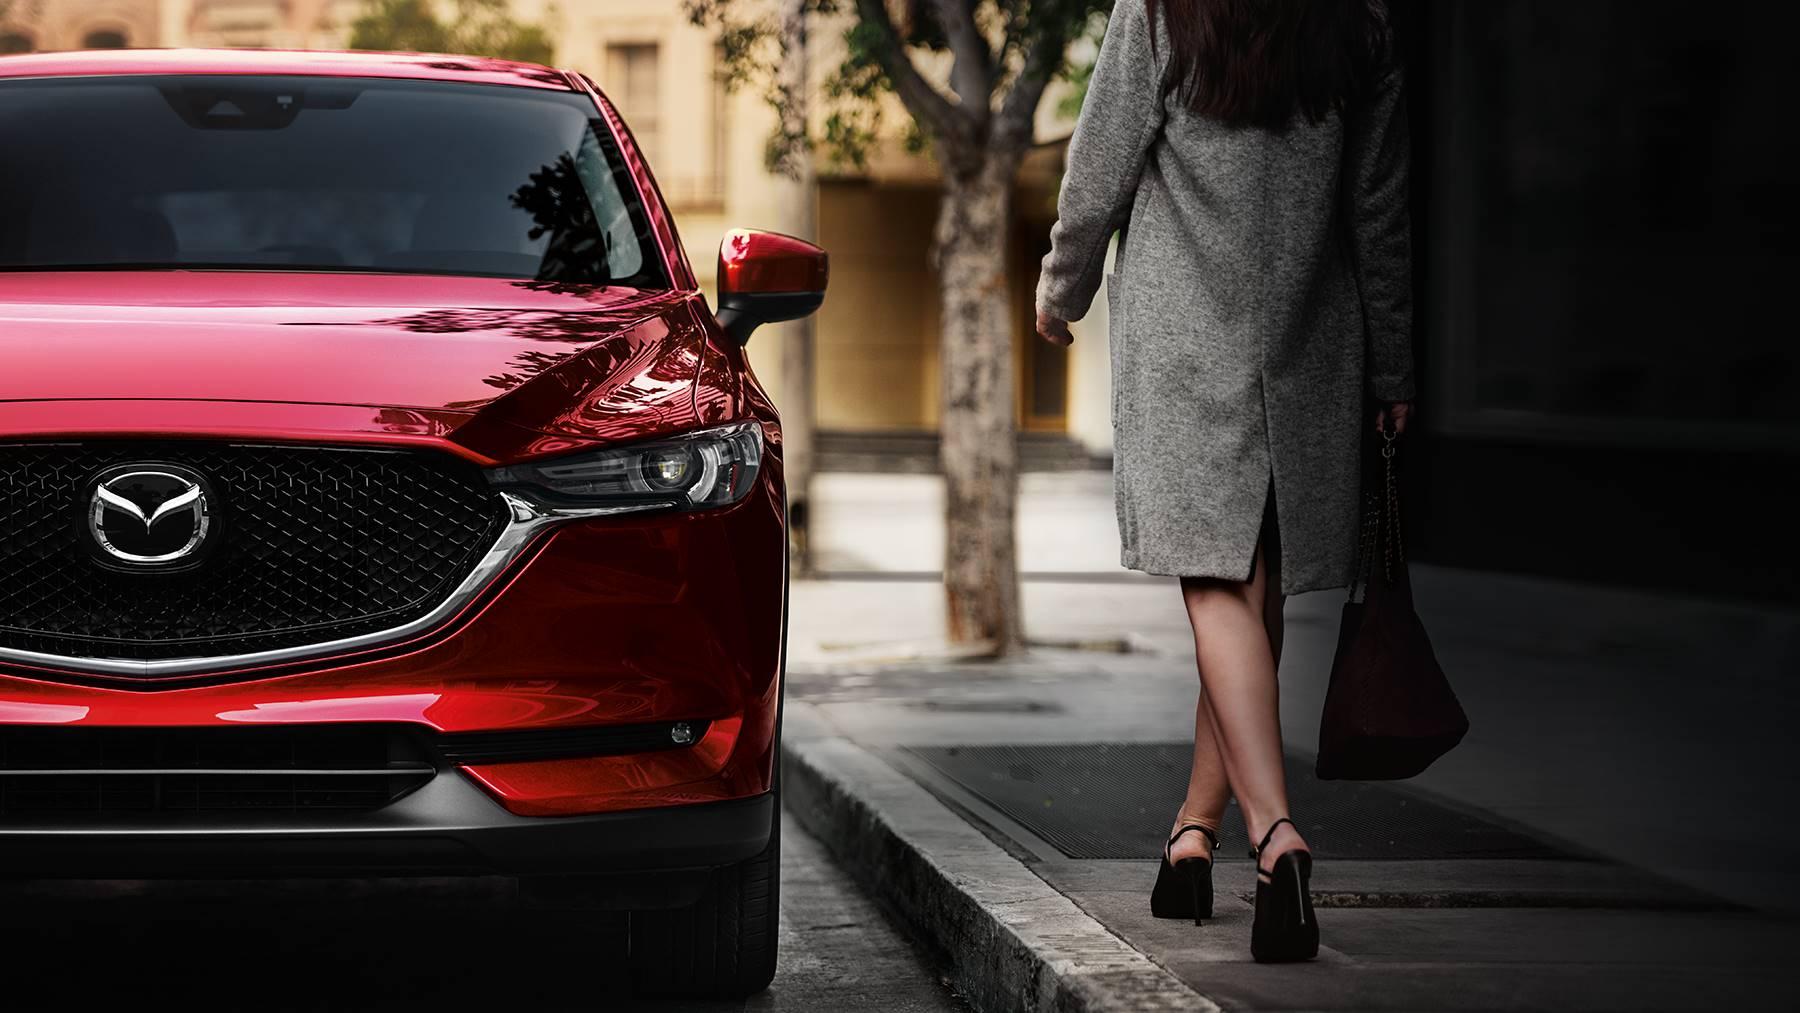 2018 Mazda CX-5 Financing near Roseville, CA